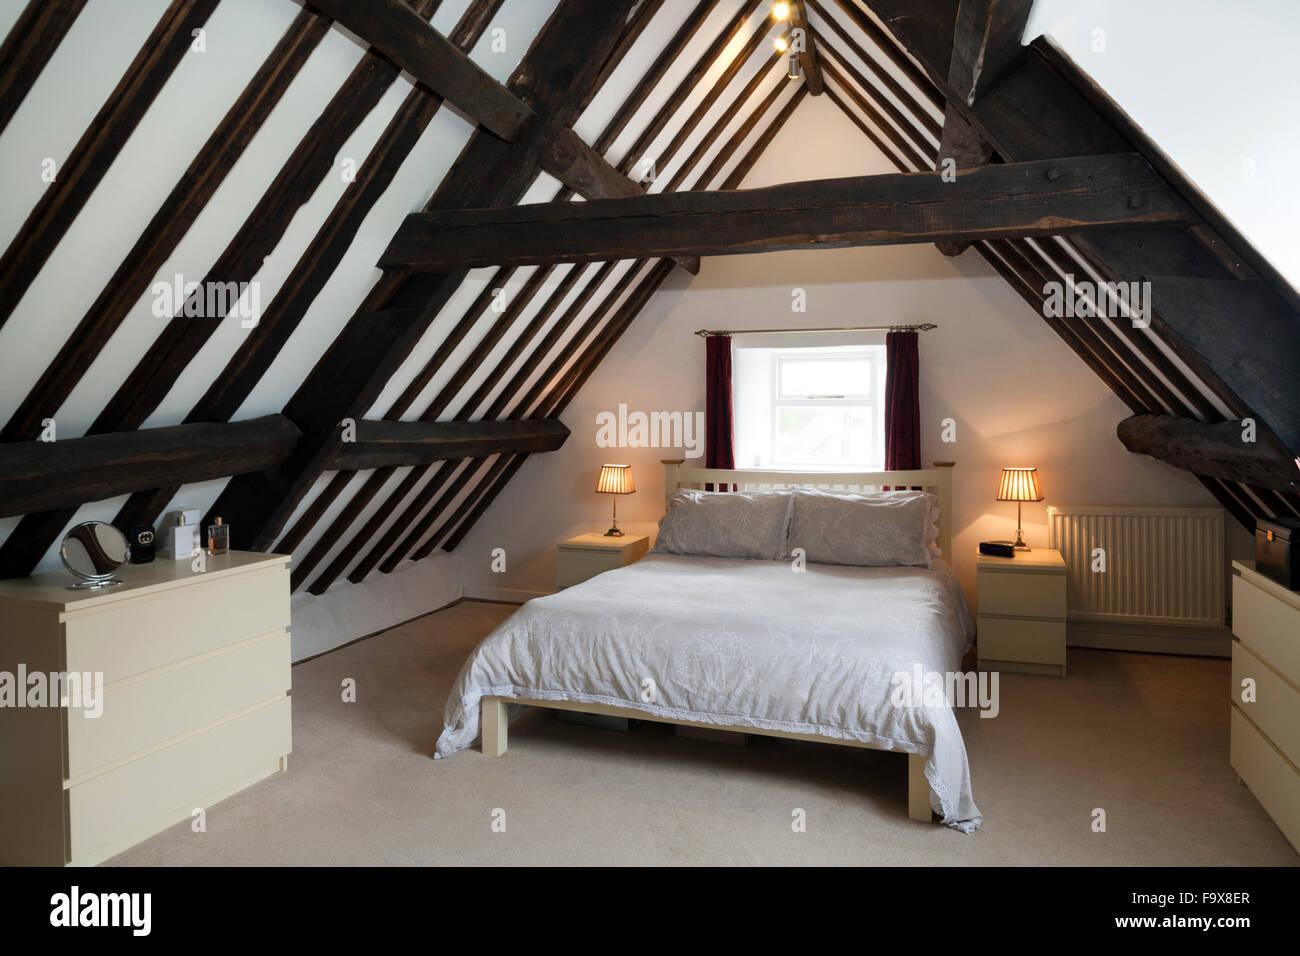 Alte Dachgeschoss Schlafzimmer mit modernem Ikea Möbeln Stockfoto ...